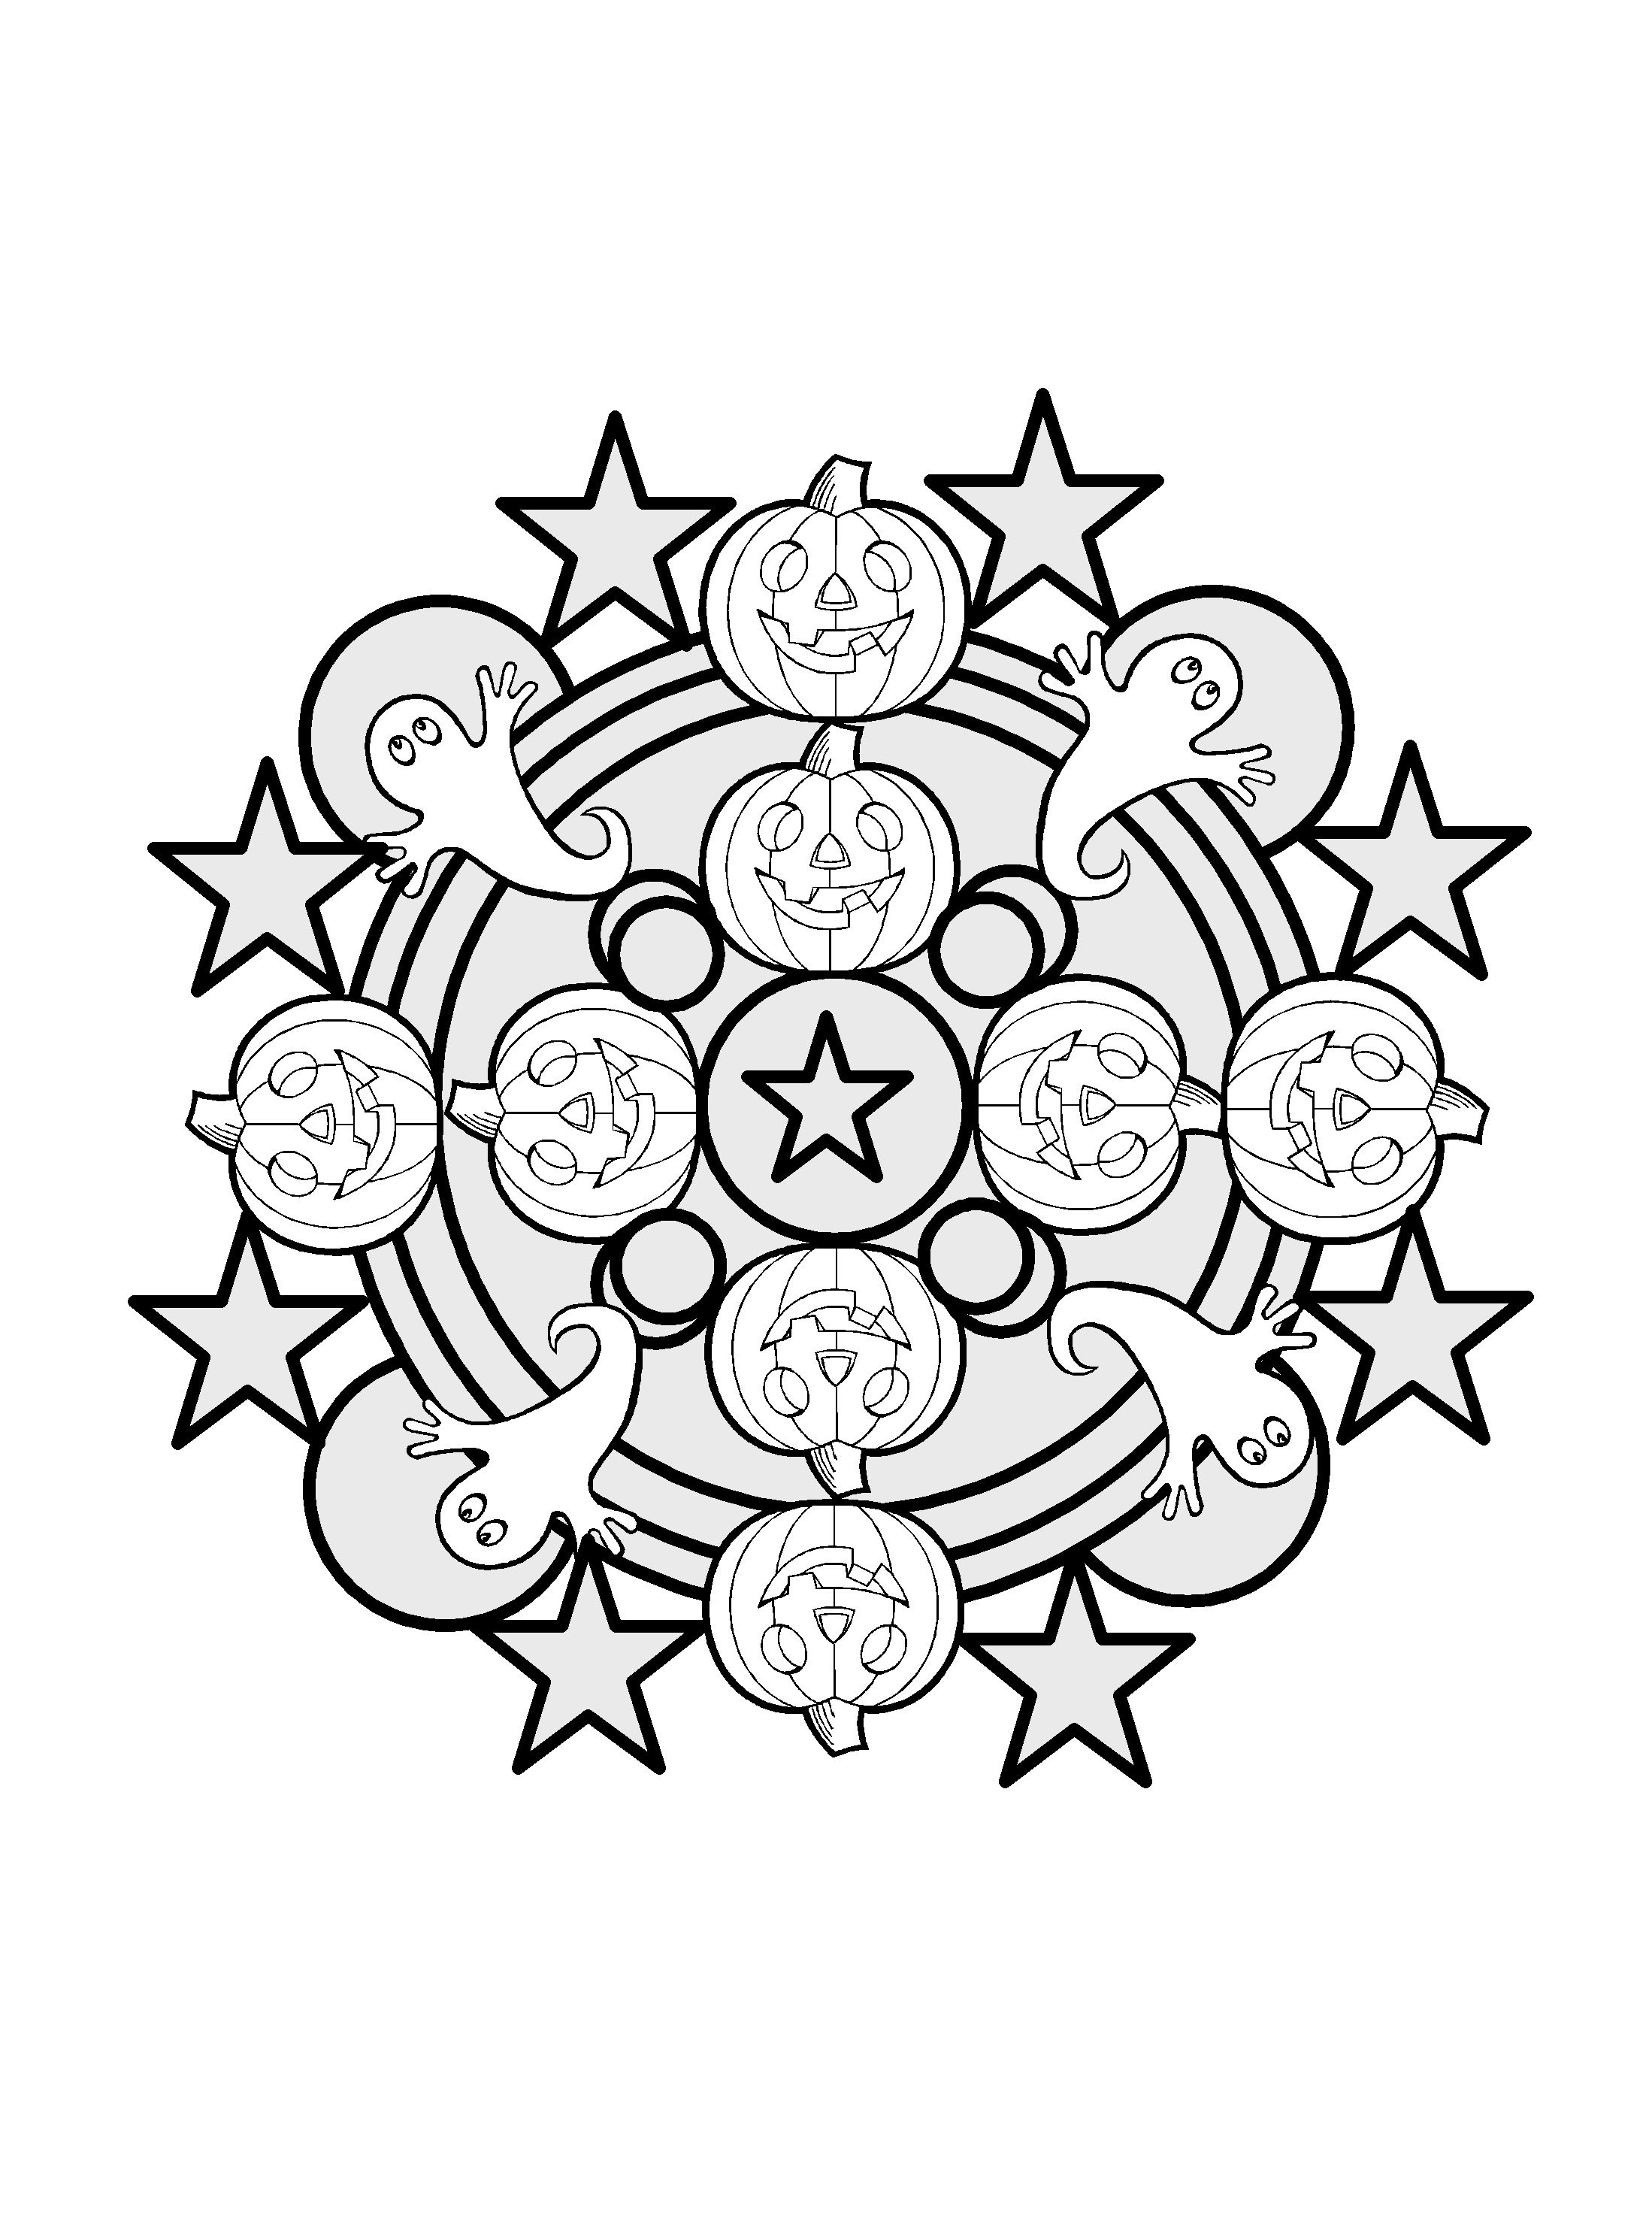 Mandala Coloring Page Mandala Coloring Pages Coloring Pages Mandala Coloring